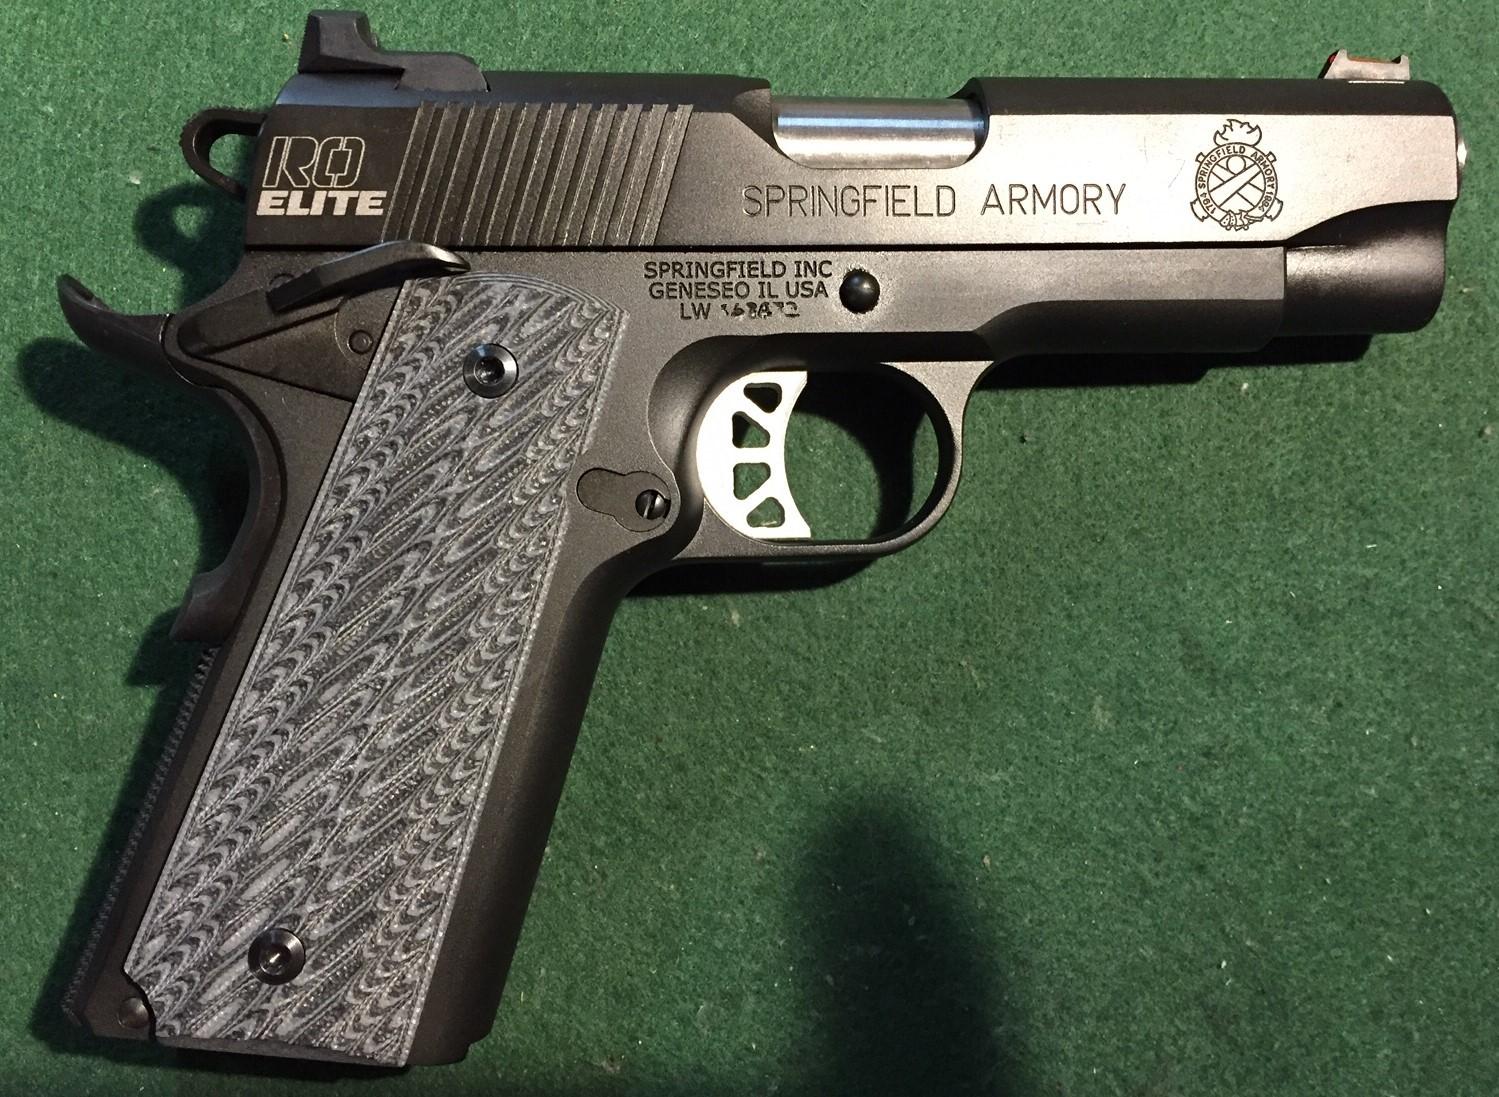 Defender Ethos: Springfield Armory Range Officer Elite